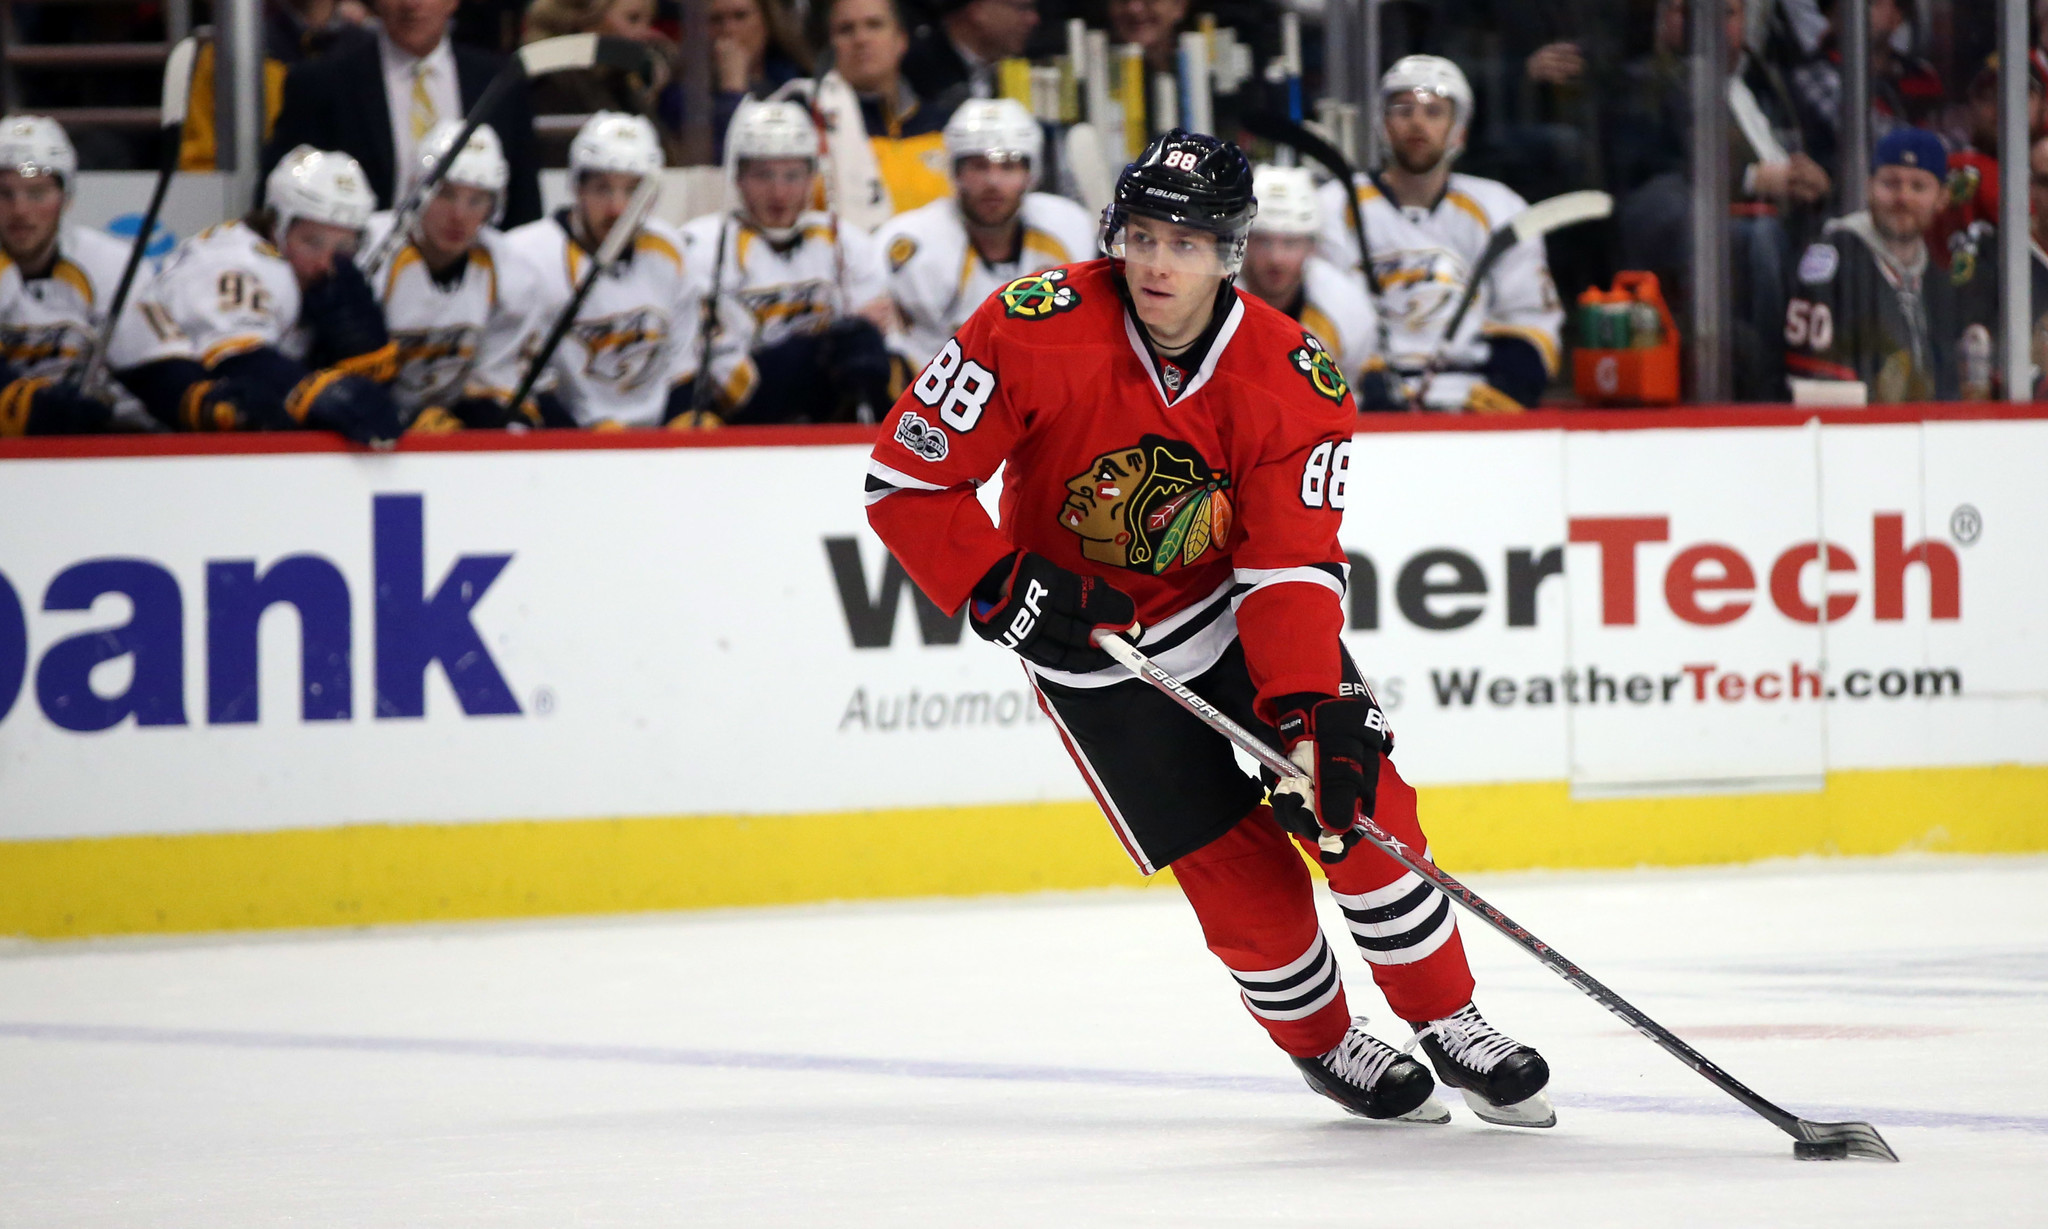 4 Blackhawks selected for NHL All-Star Game